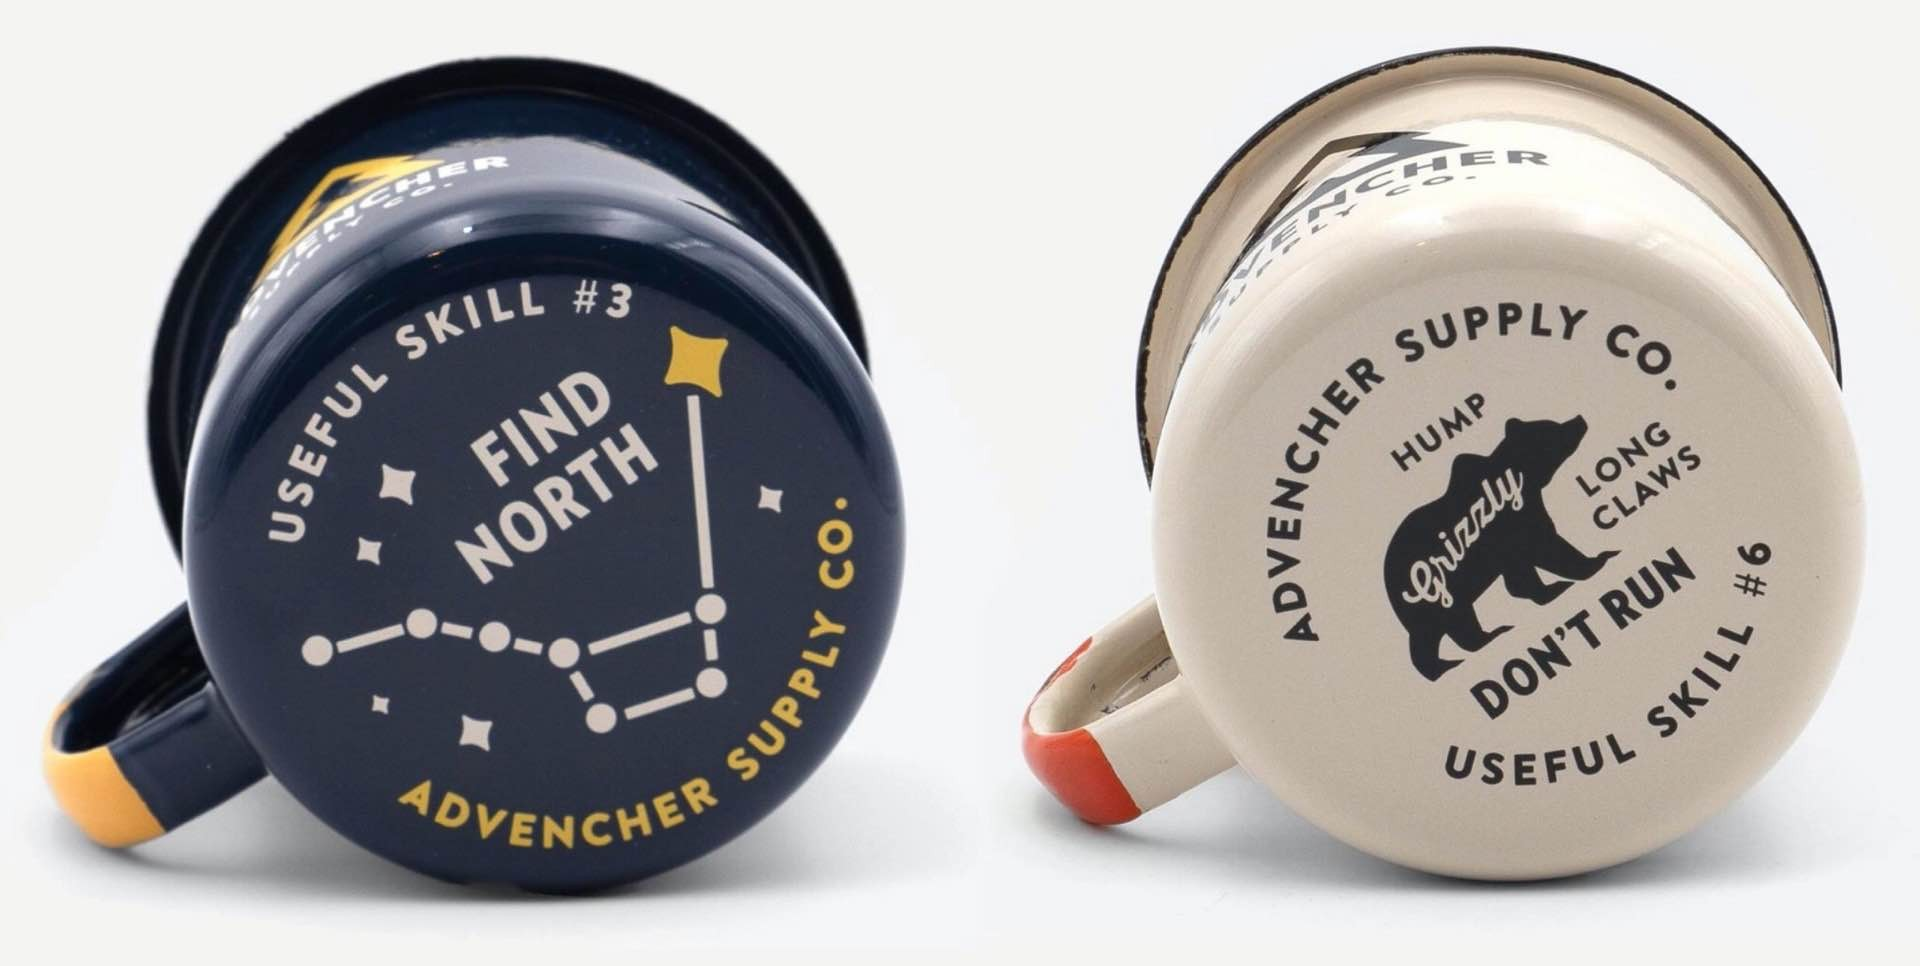 advencher-supply-co-enamel-mugs-bottom-survival-tips